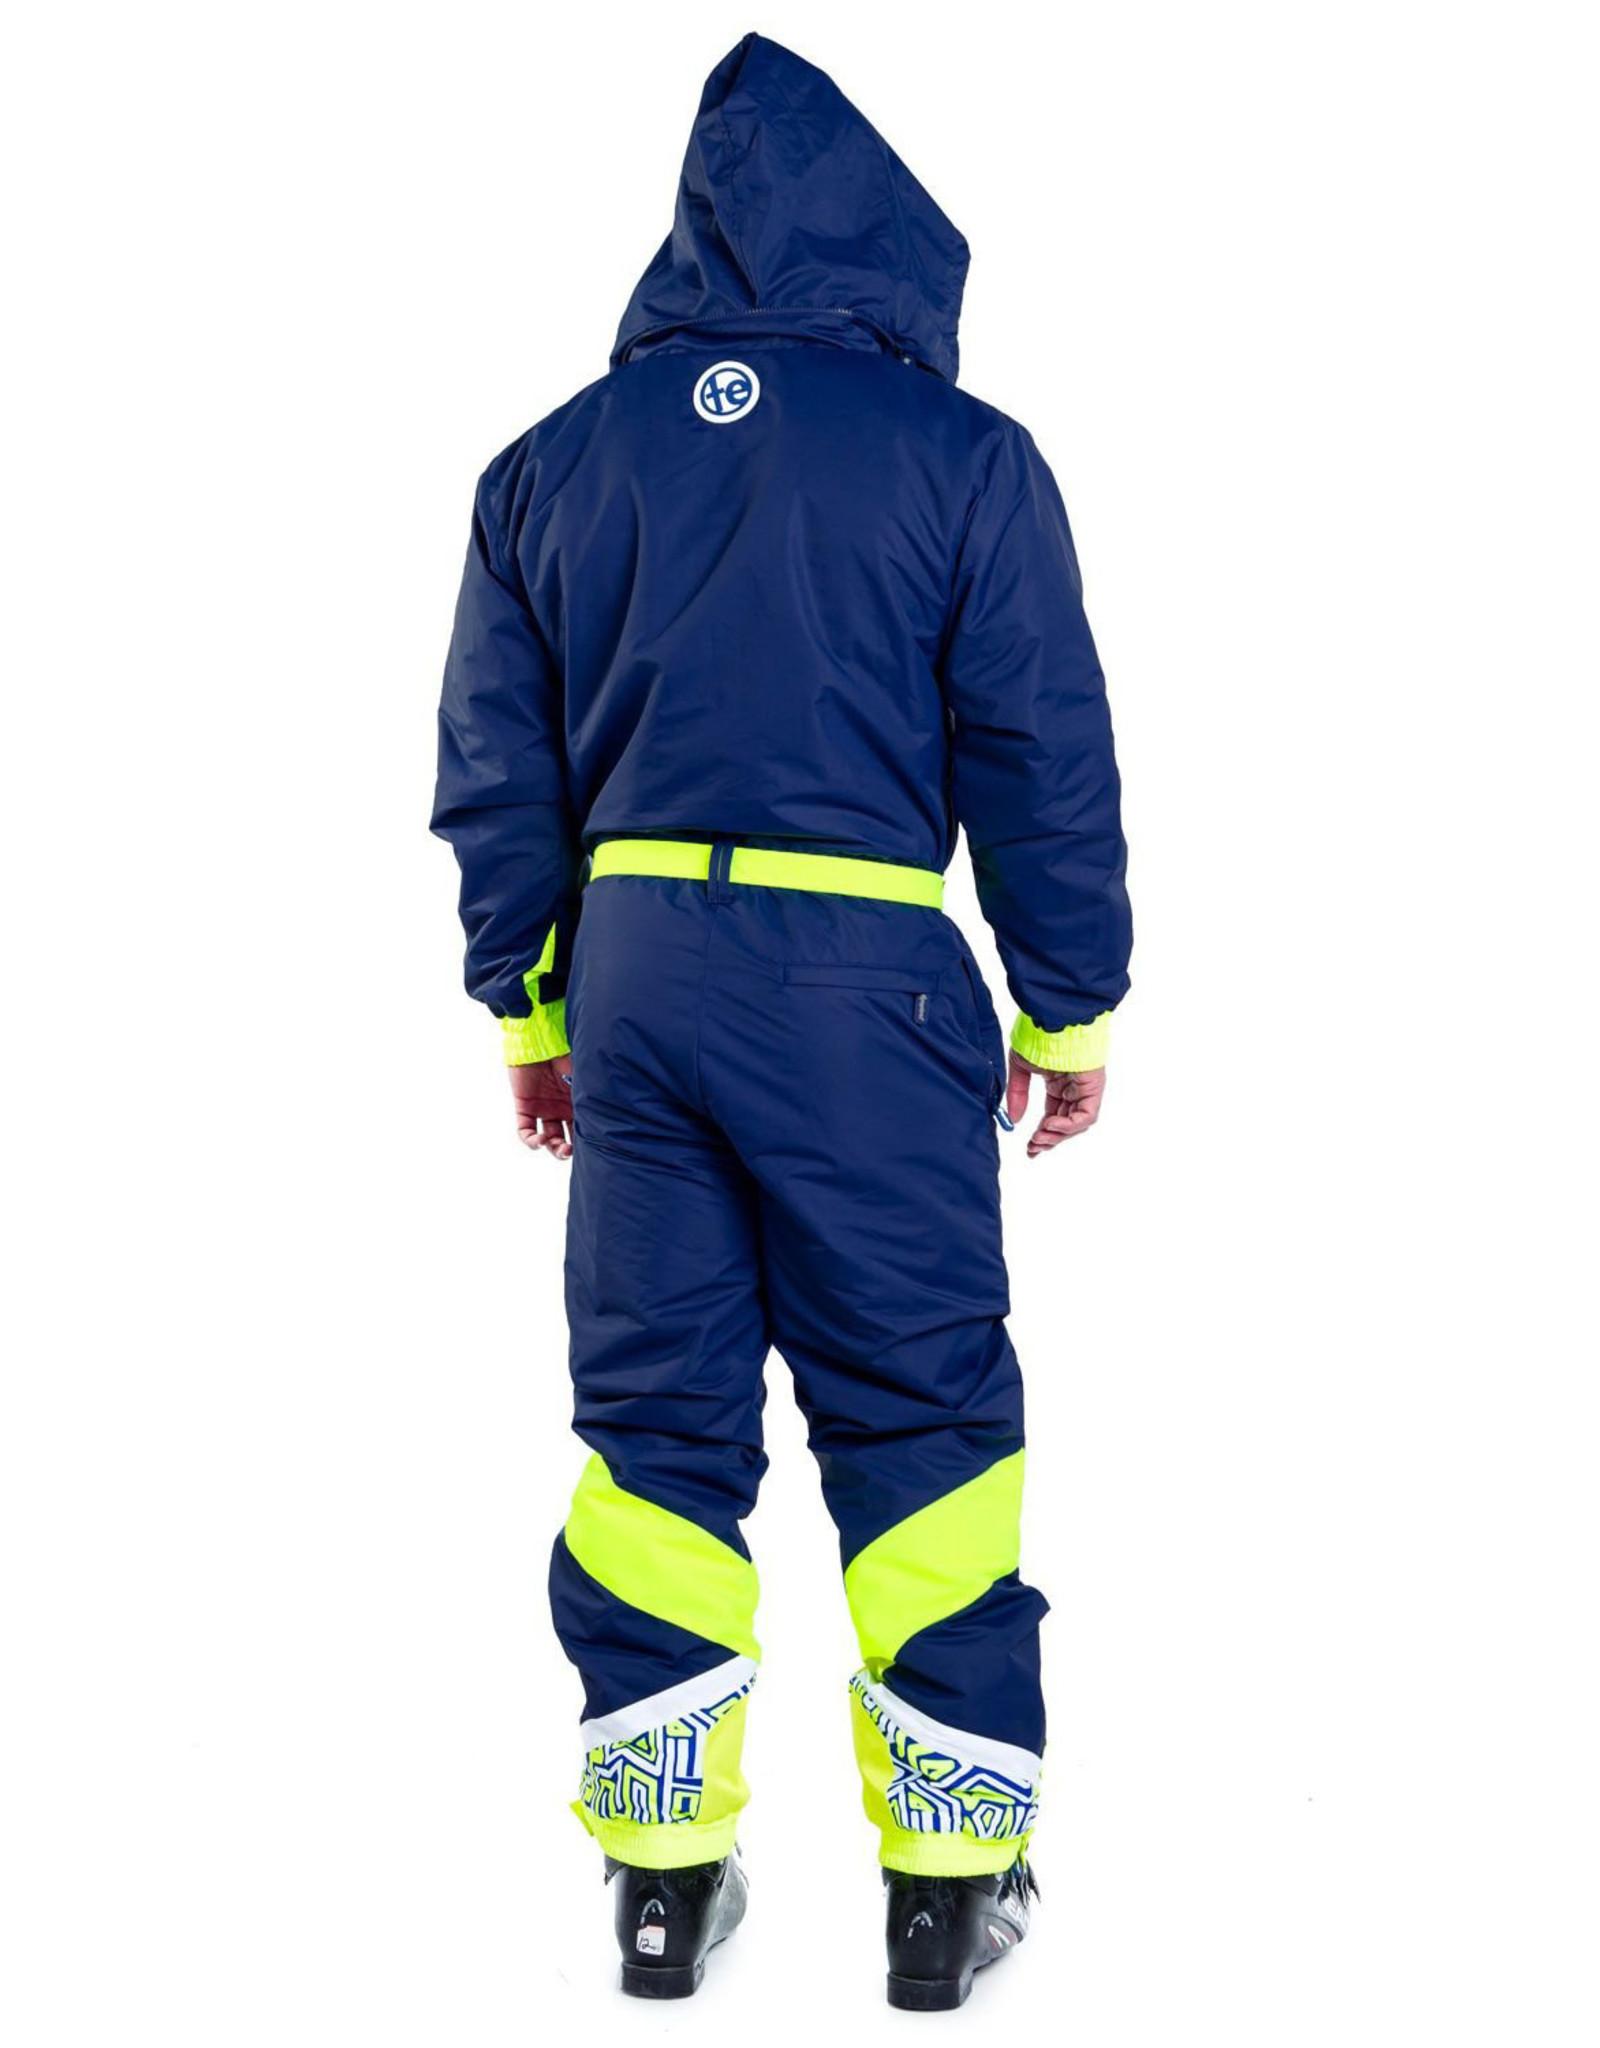 Tipsy Elves Unisex Tipsy Elves Snowboard Suit